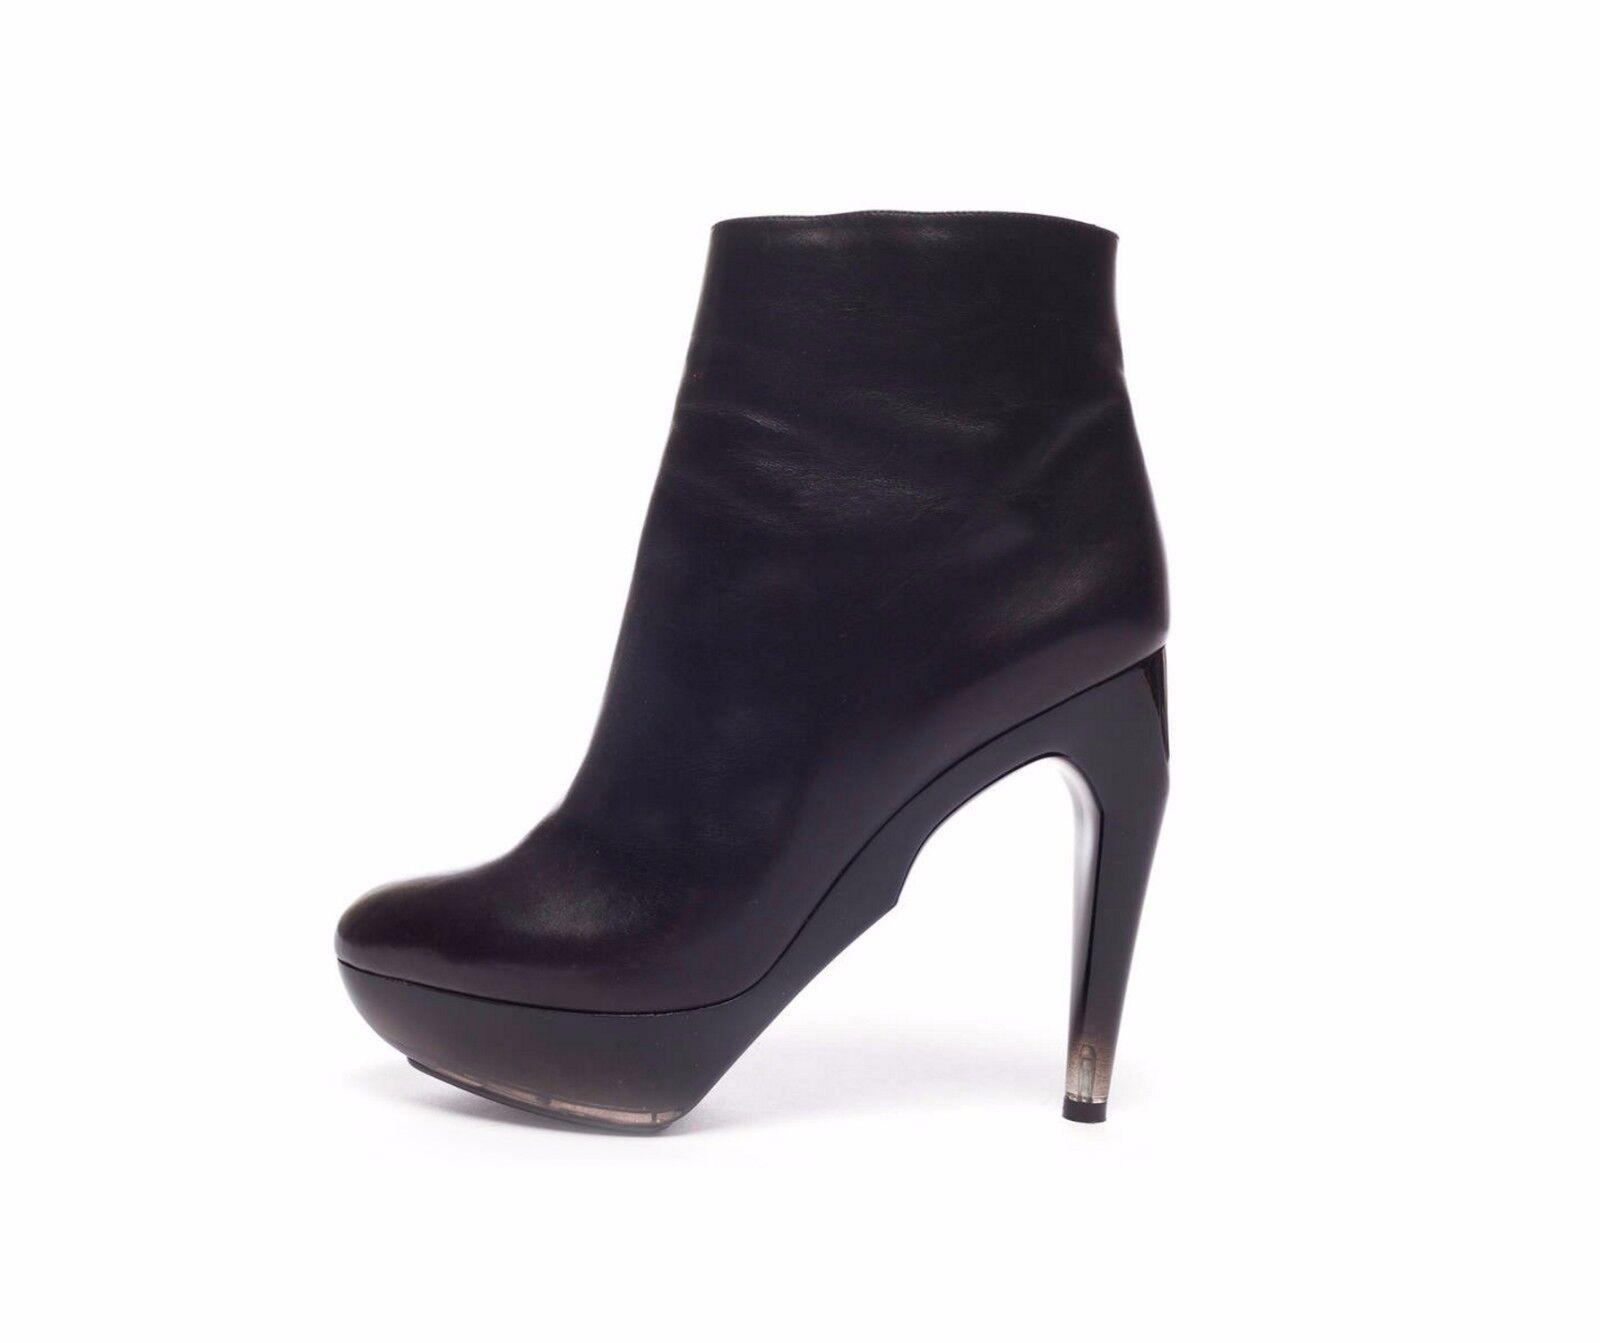 JIL SANDER Raf Simons Boots Scarpe Stivali SZ 41 Amazin heel VERY COMFY! AW 2009